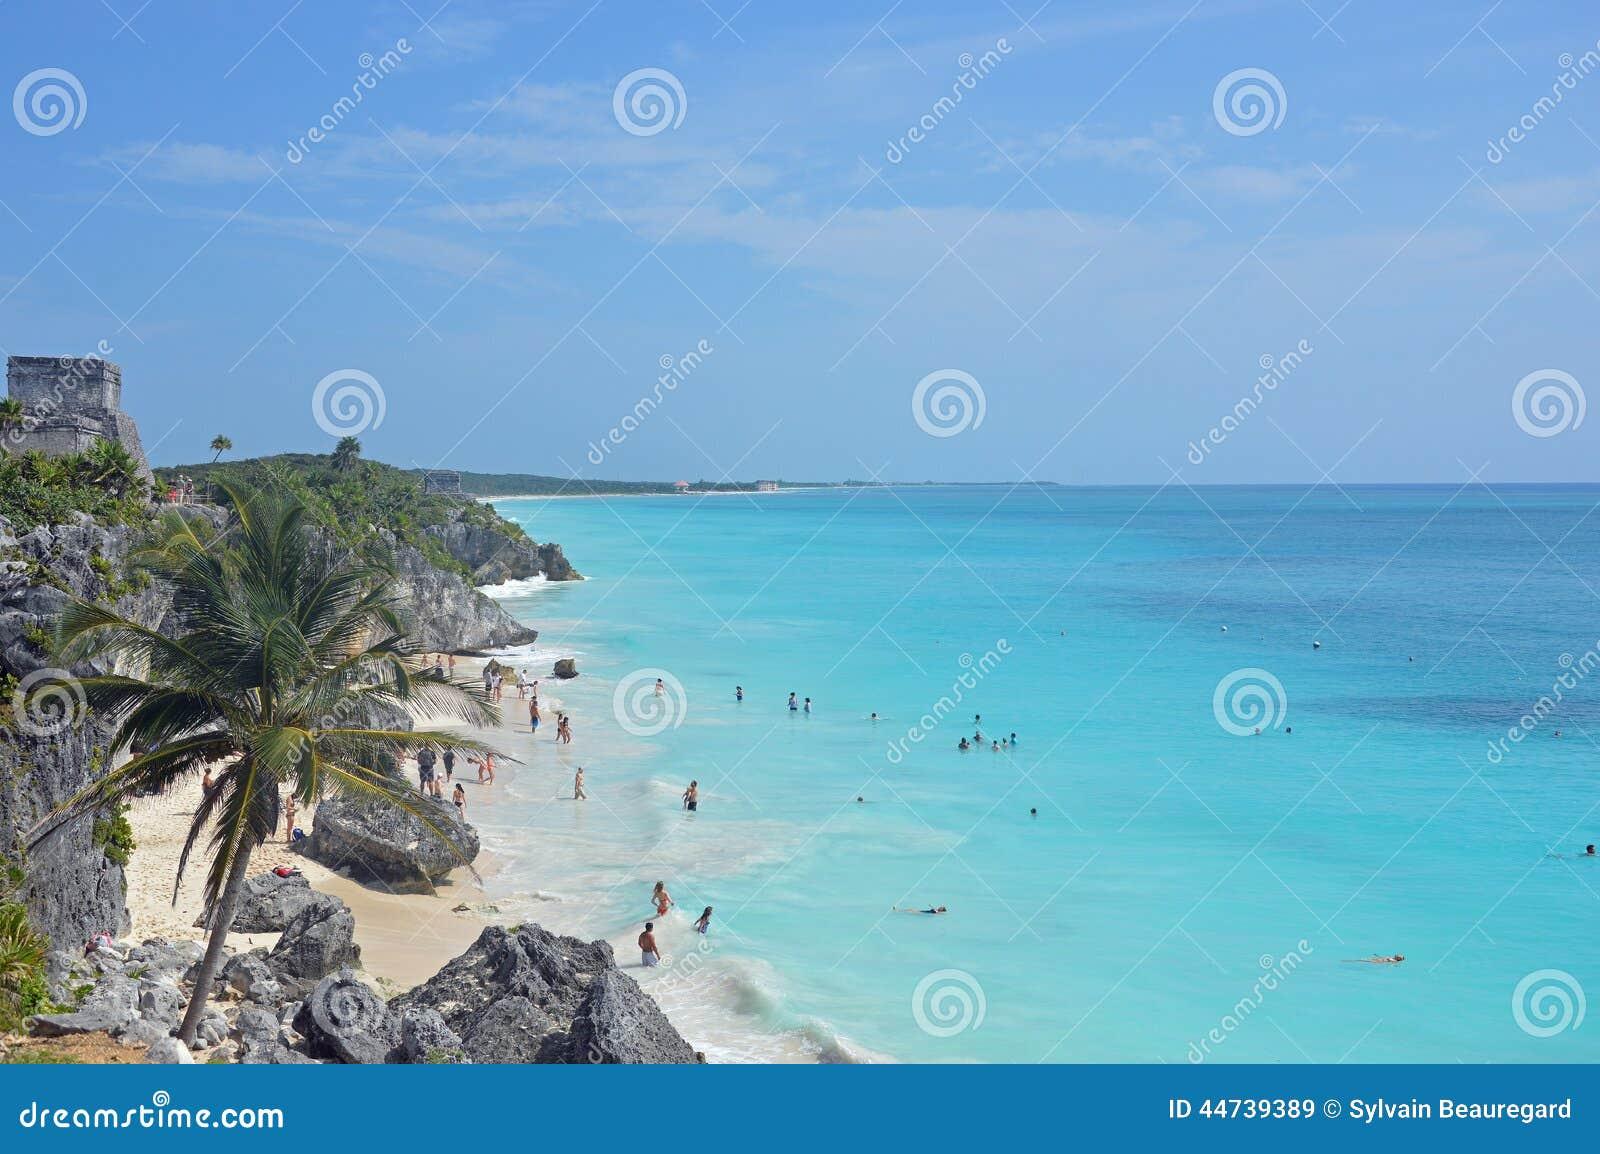 Tulum beach and ruins